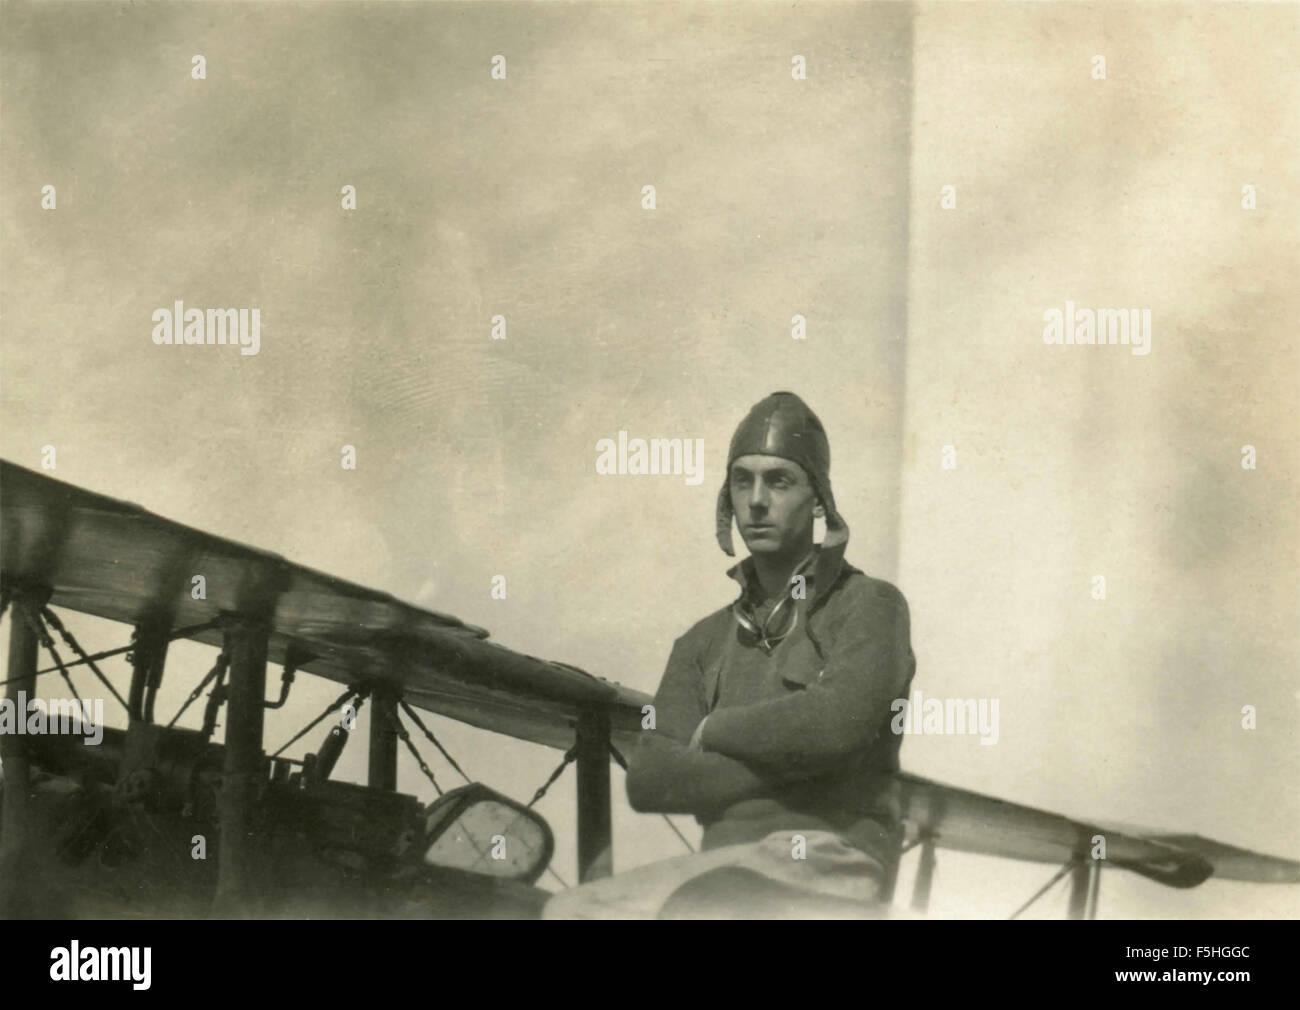 An airman next to his plane, Italy - Stock Image